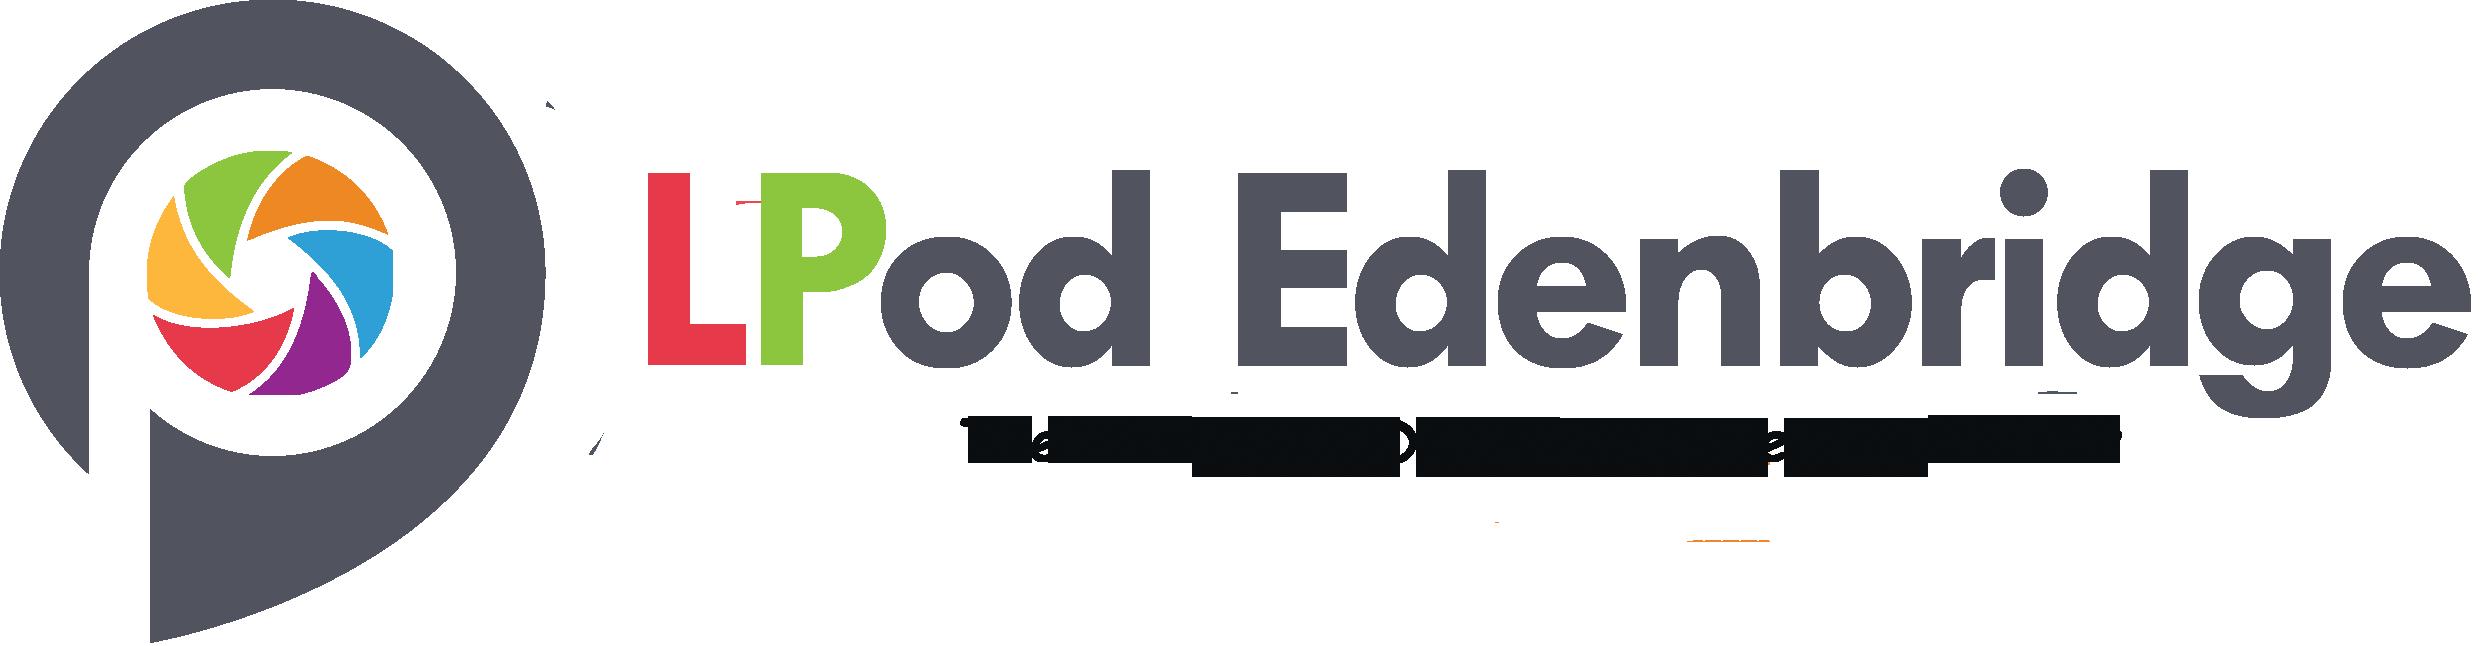 intensive driving courses Edenbridge